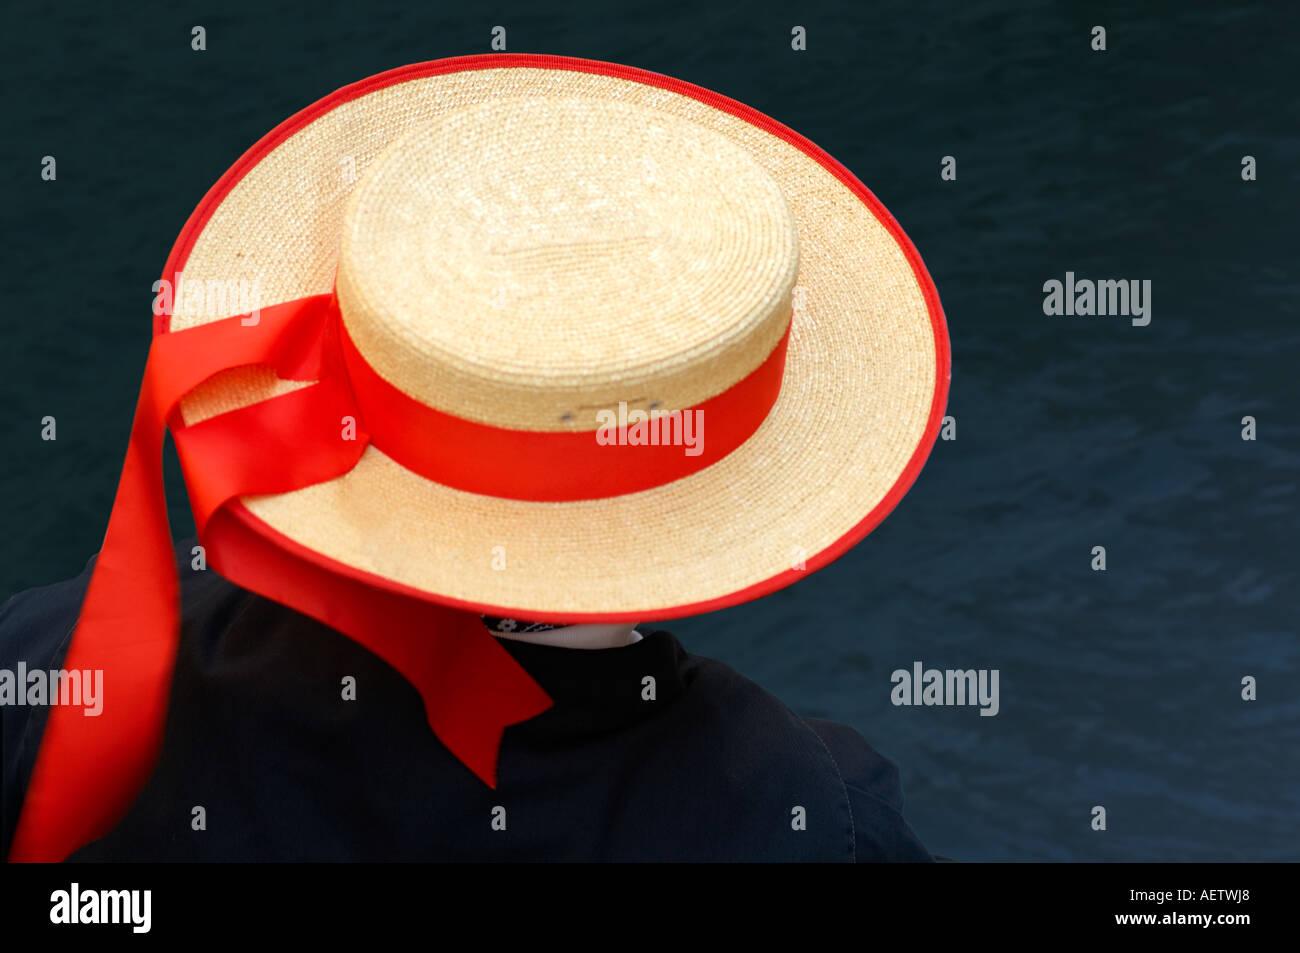 17b6abb8bee Straw Hat Red Ribbon Stock Photos   Straw Hat Red Ribbon Stock ...